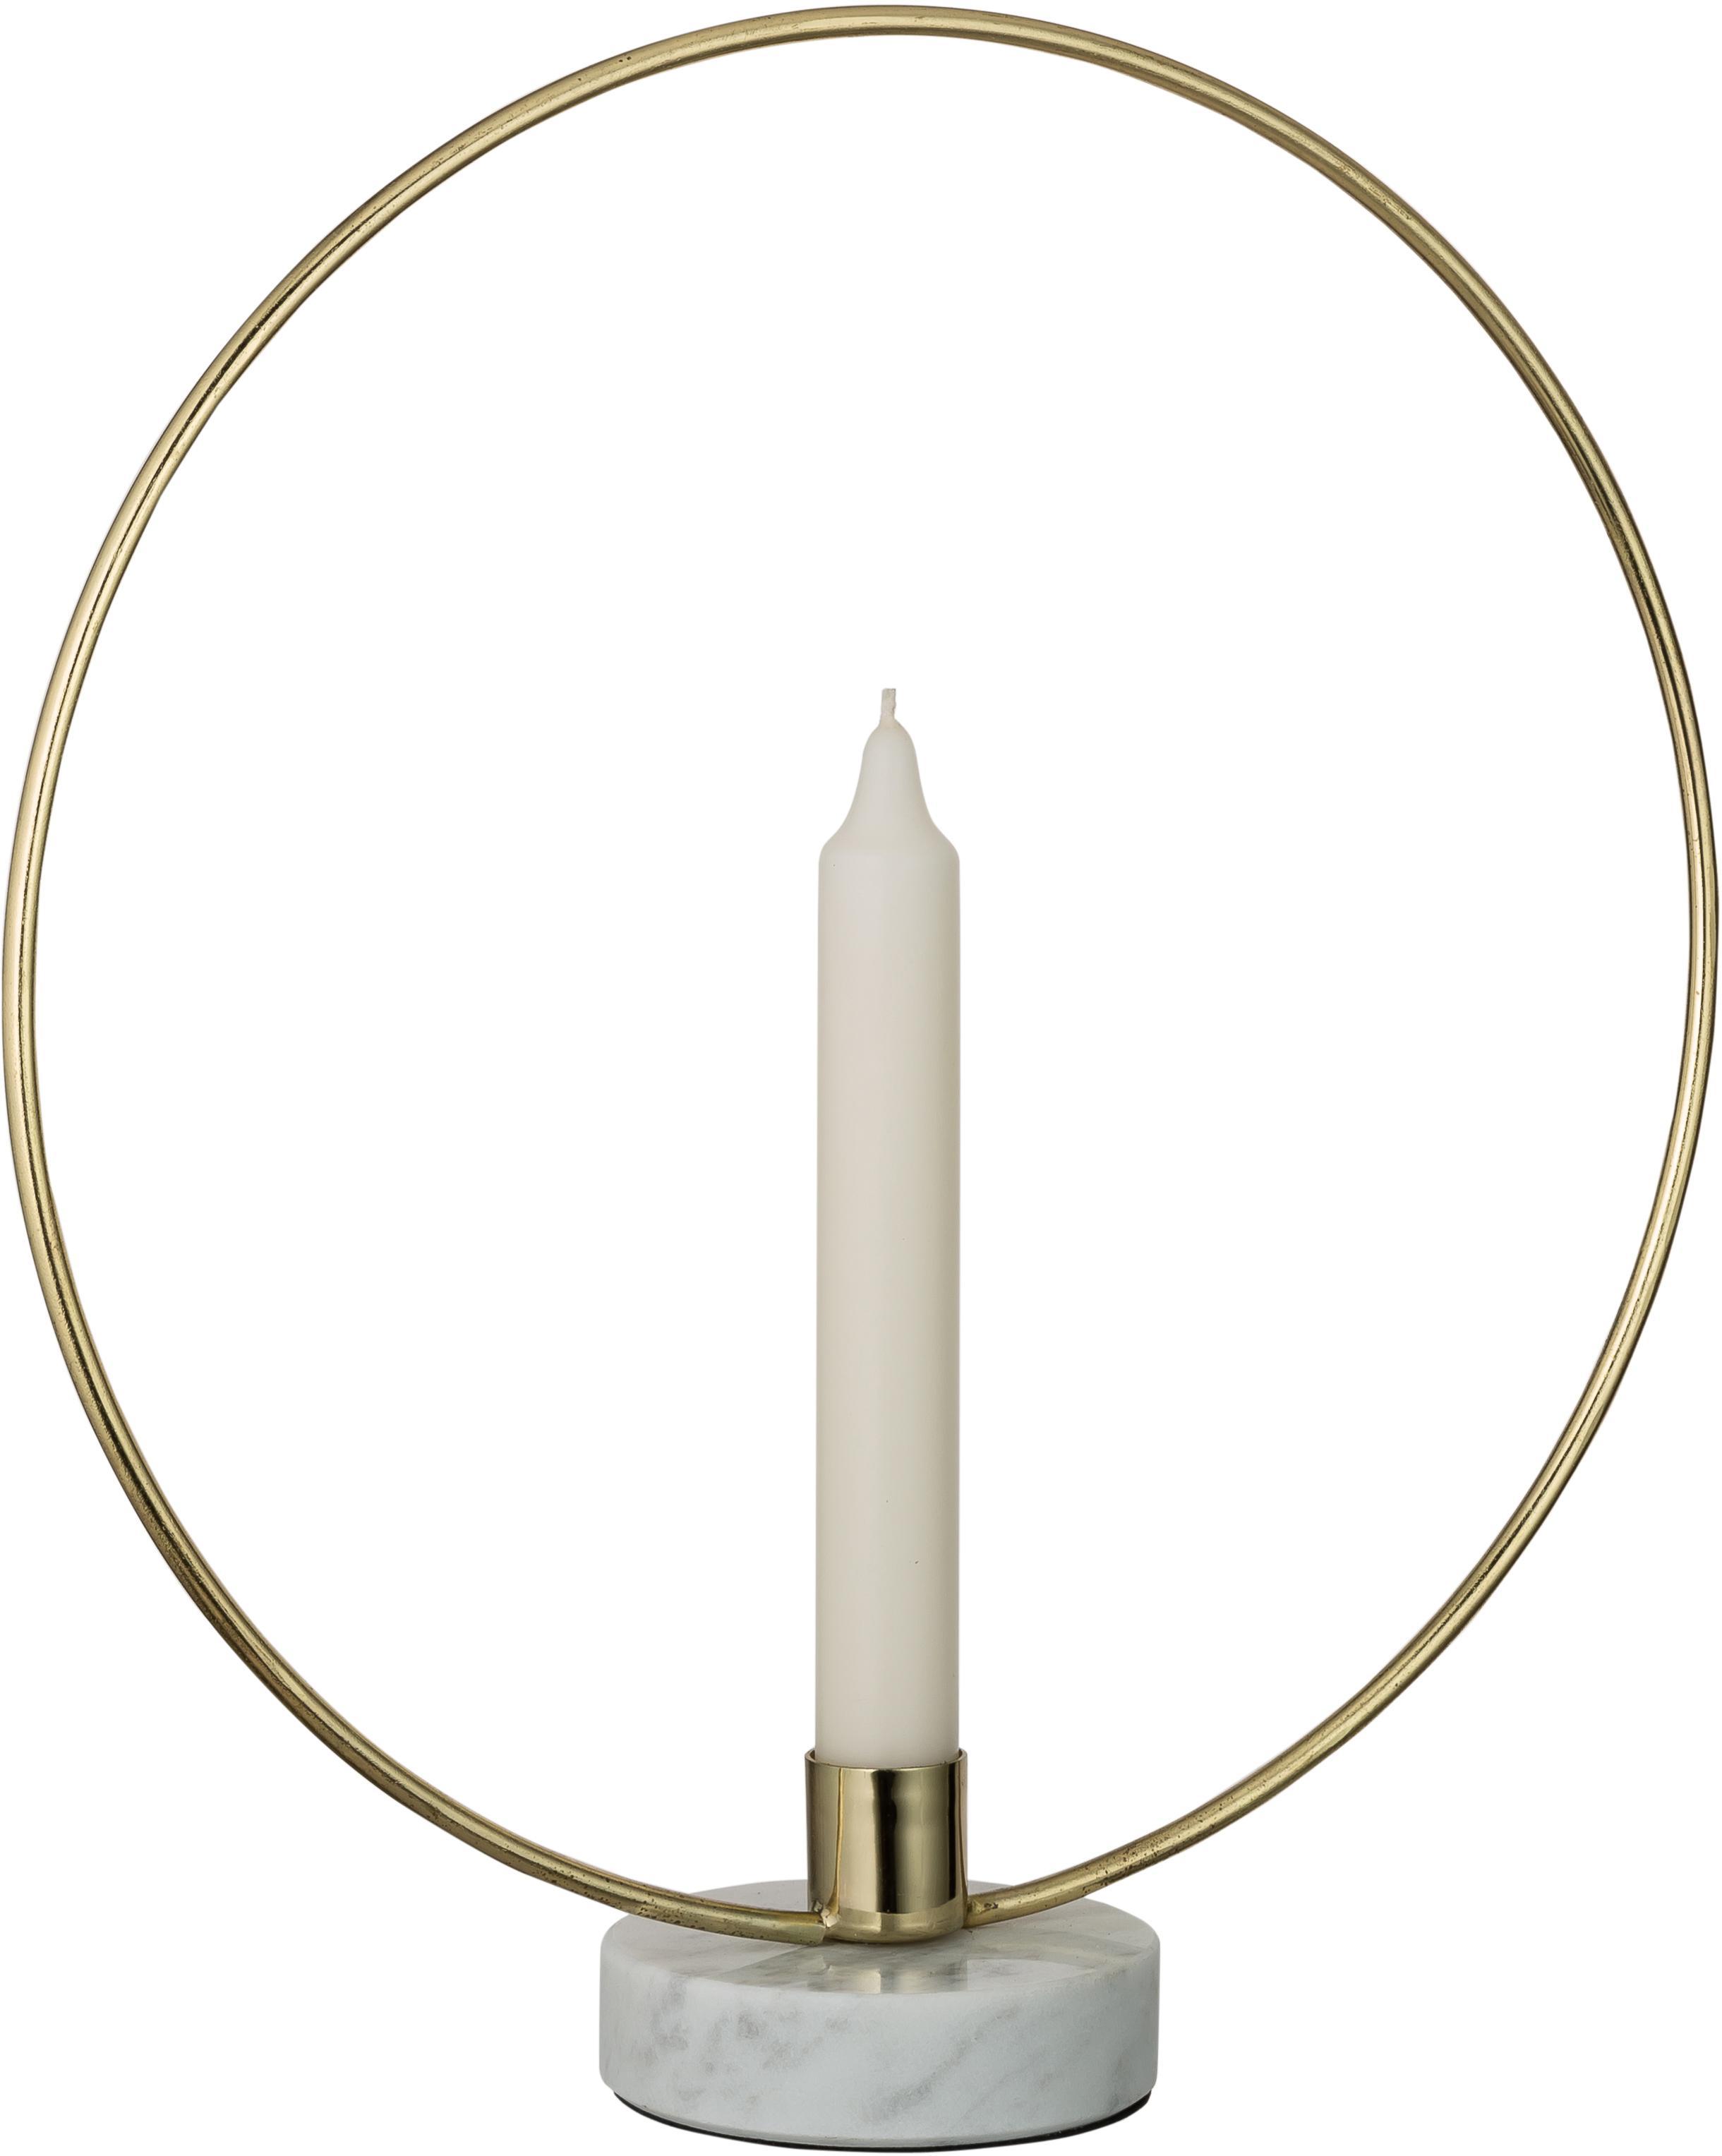 Candelabro Ring, Candelabro: metallo rivestito, Gambo: marmo, Dorato , bianco, Larg. 28 x Alt. 30 cm